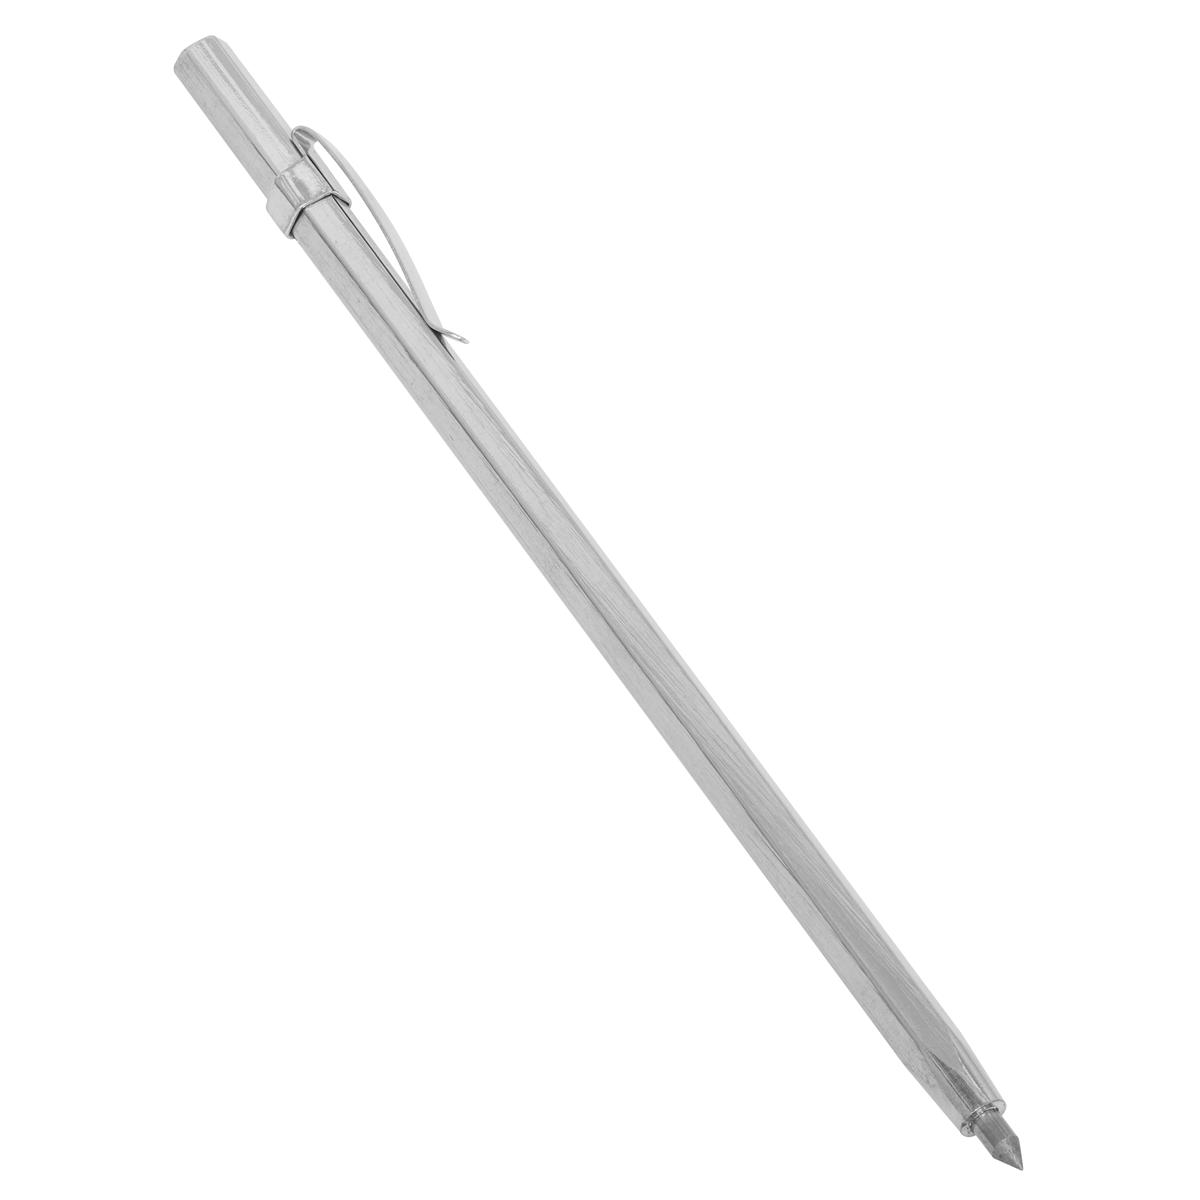 Carbide Tipped Scriber